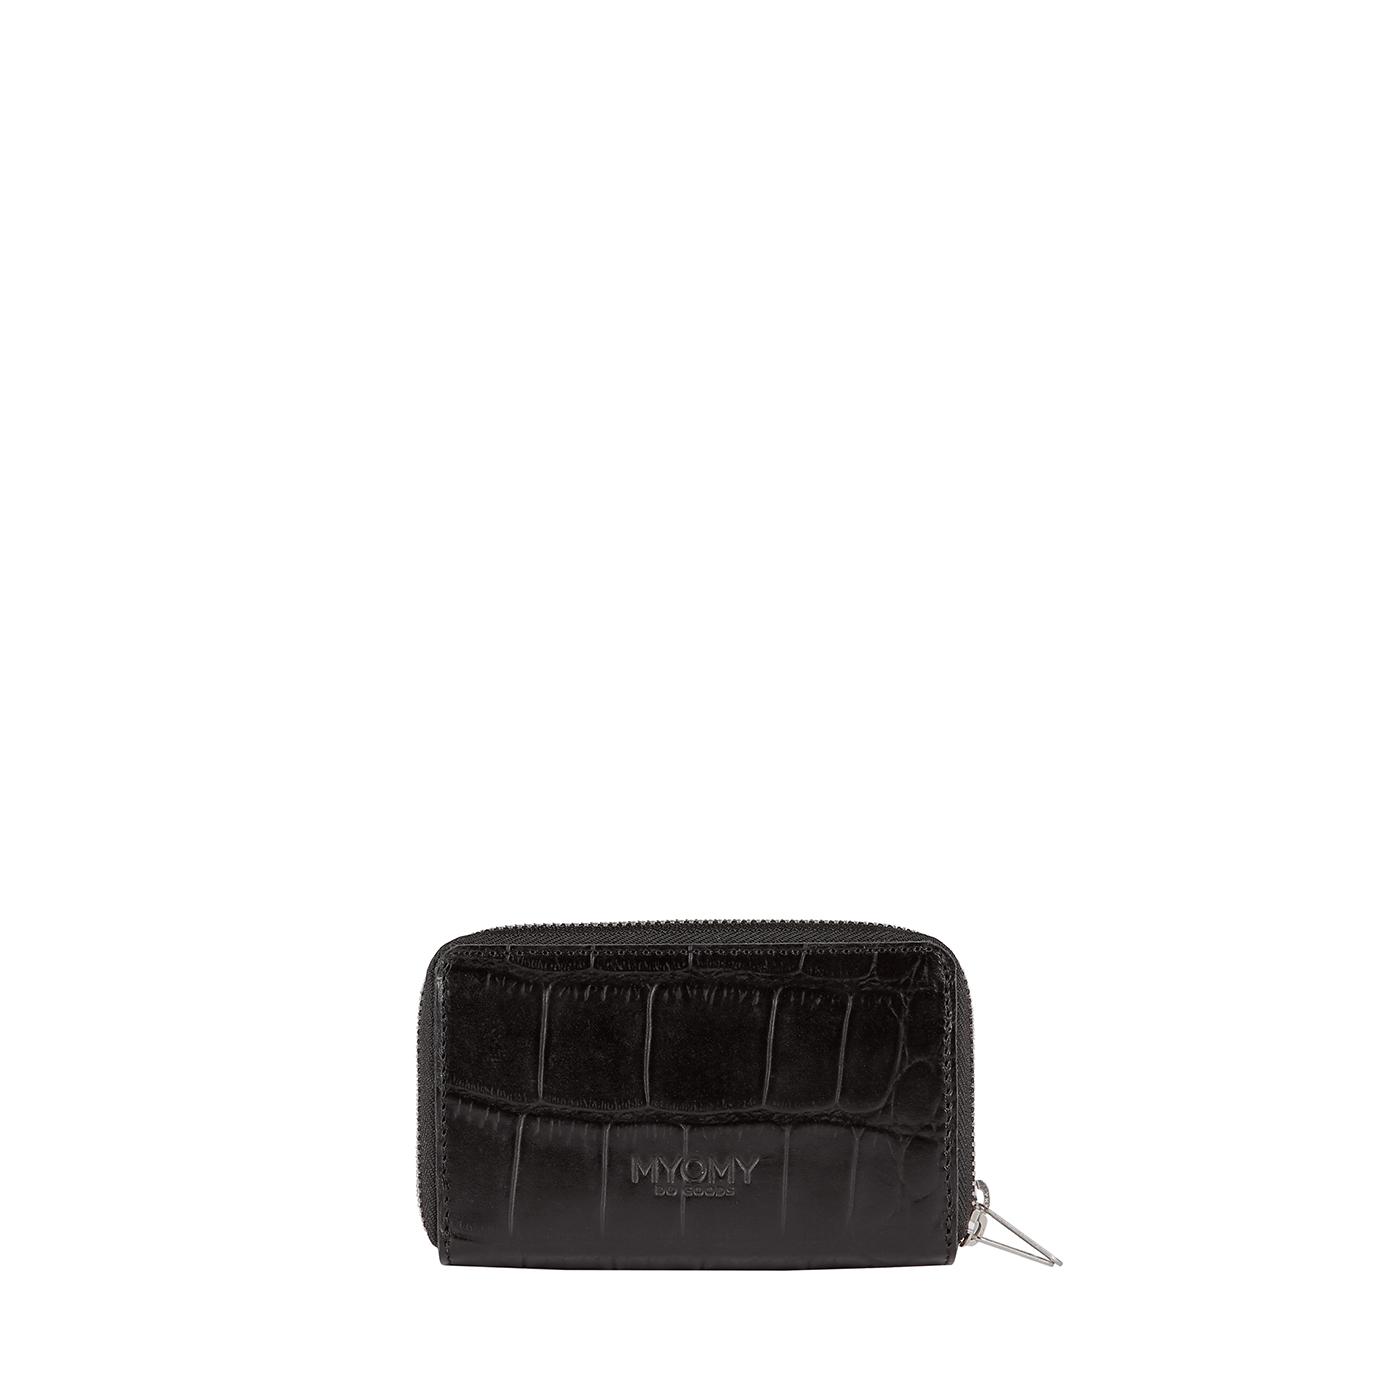 MY PAPER BAG Wallet Medium (RFID) - croco black